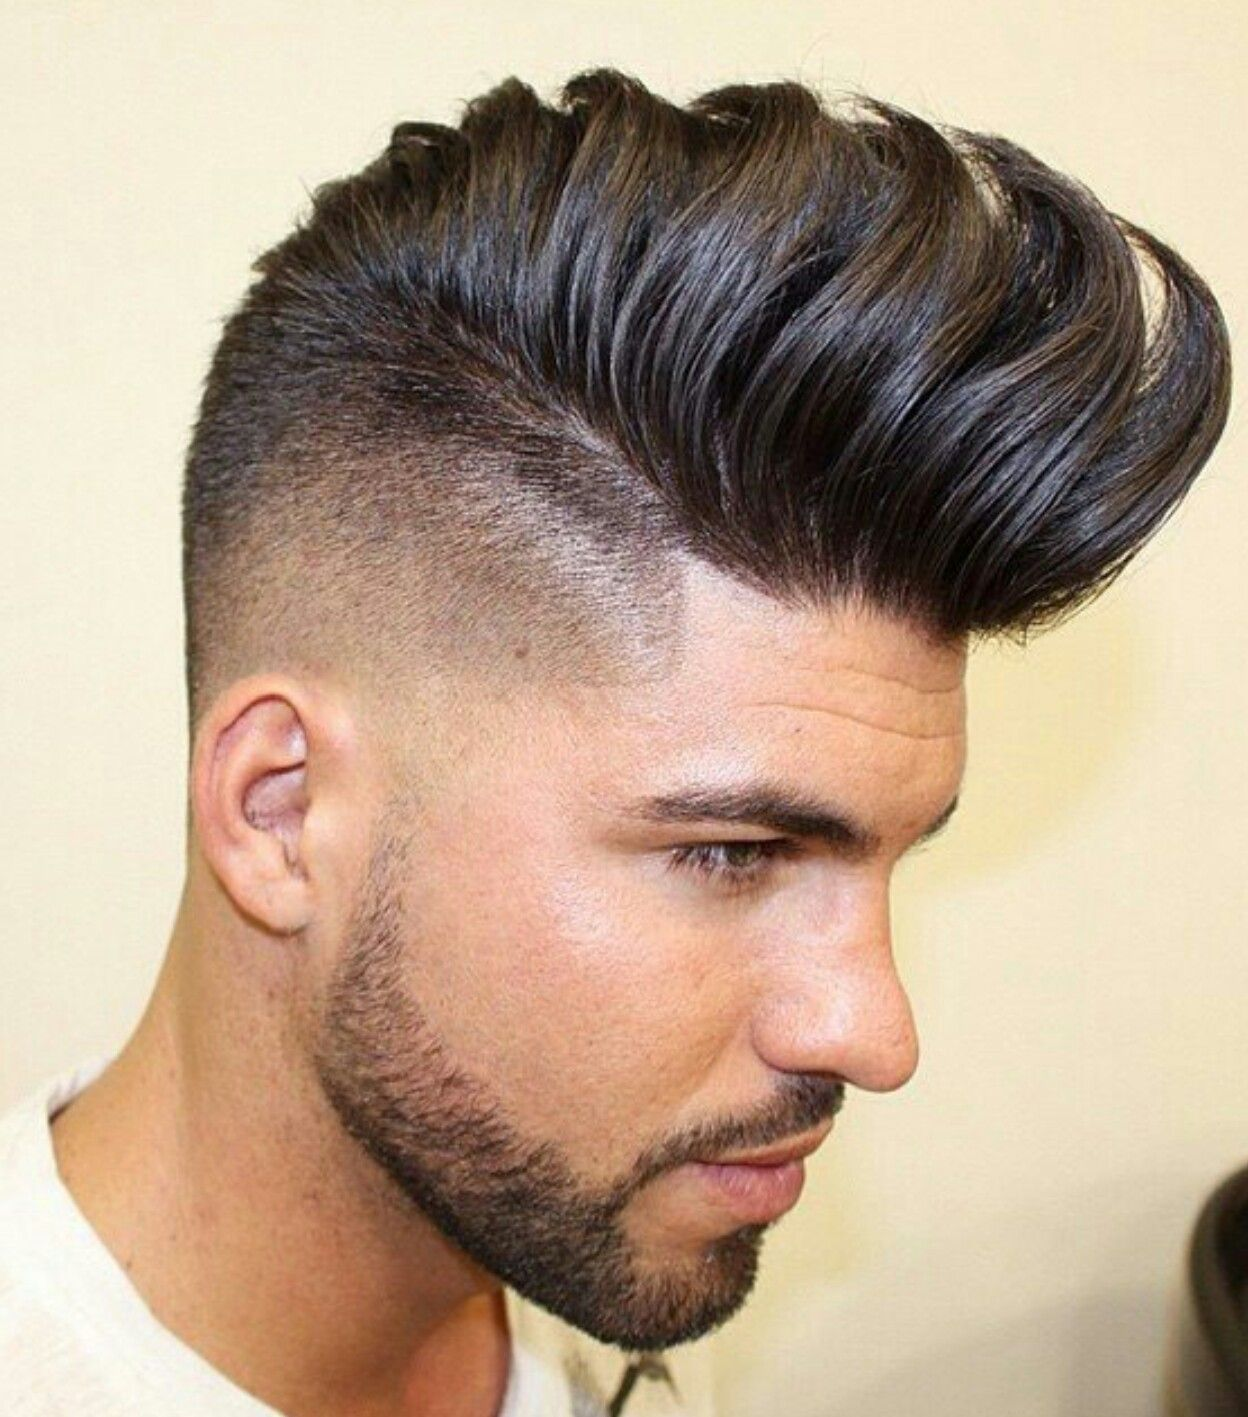 estuche cera de pelo para hombre cabello para hombres pelo peinado hacia atrs tup moderno gua de caballeros caballero atildado ideas de peinado - Peinados Tupe Hombre